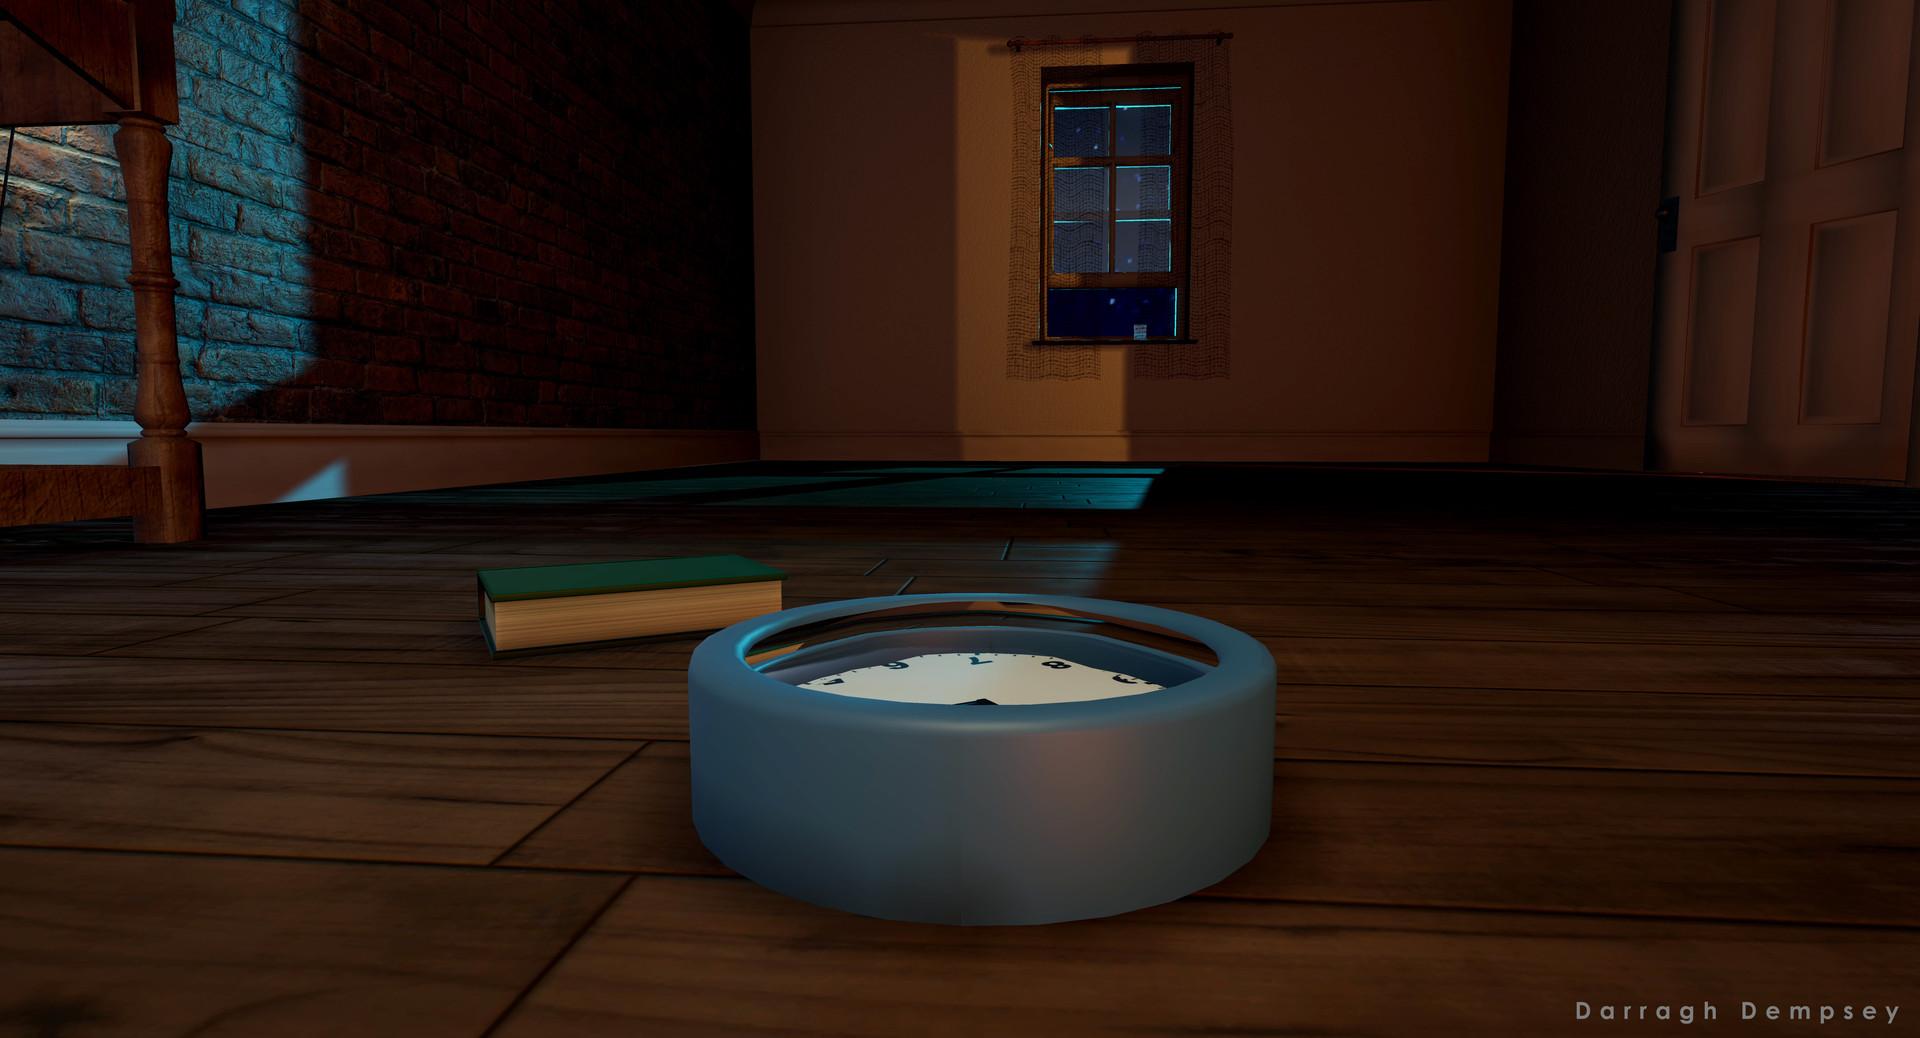 Clock and book. Unreal Engine screenshot.